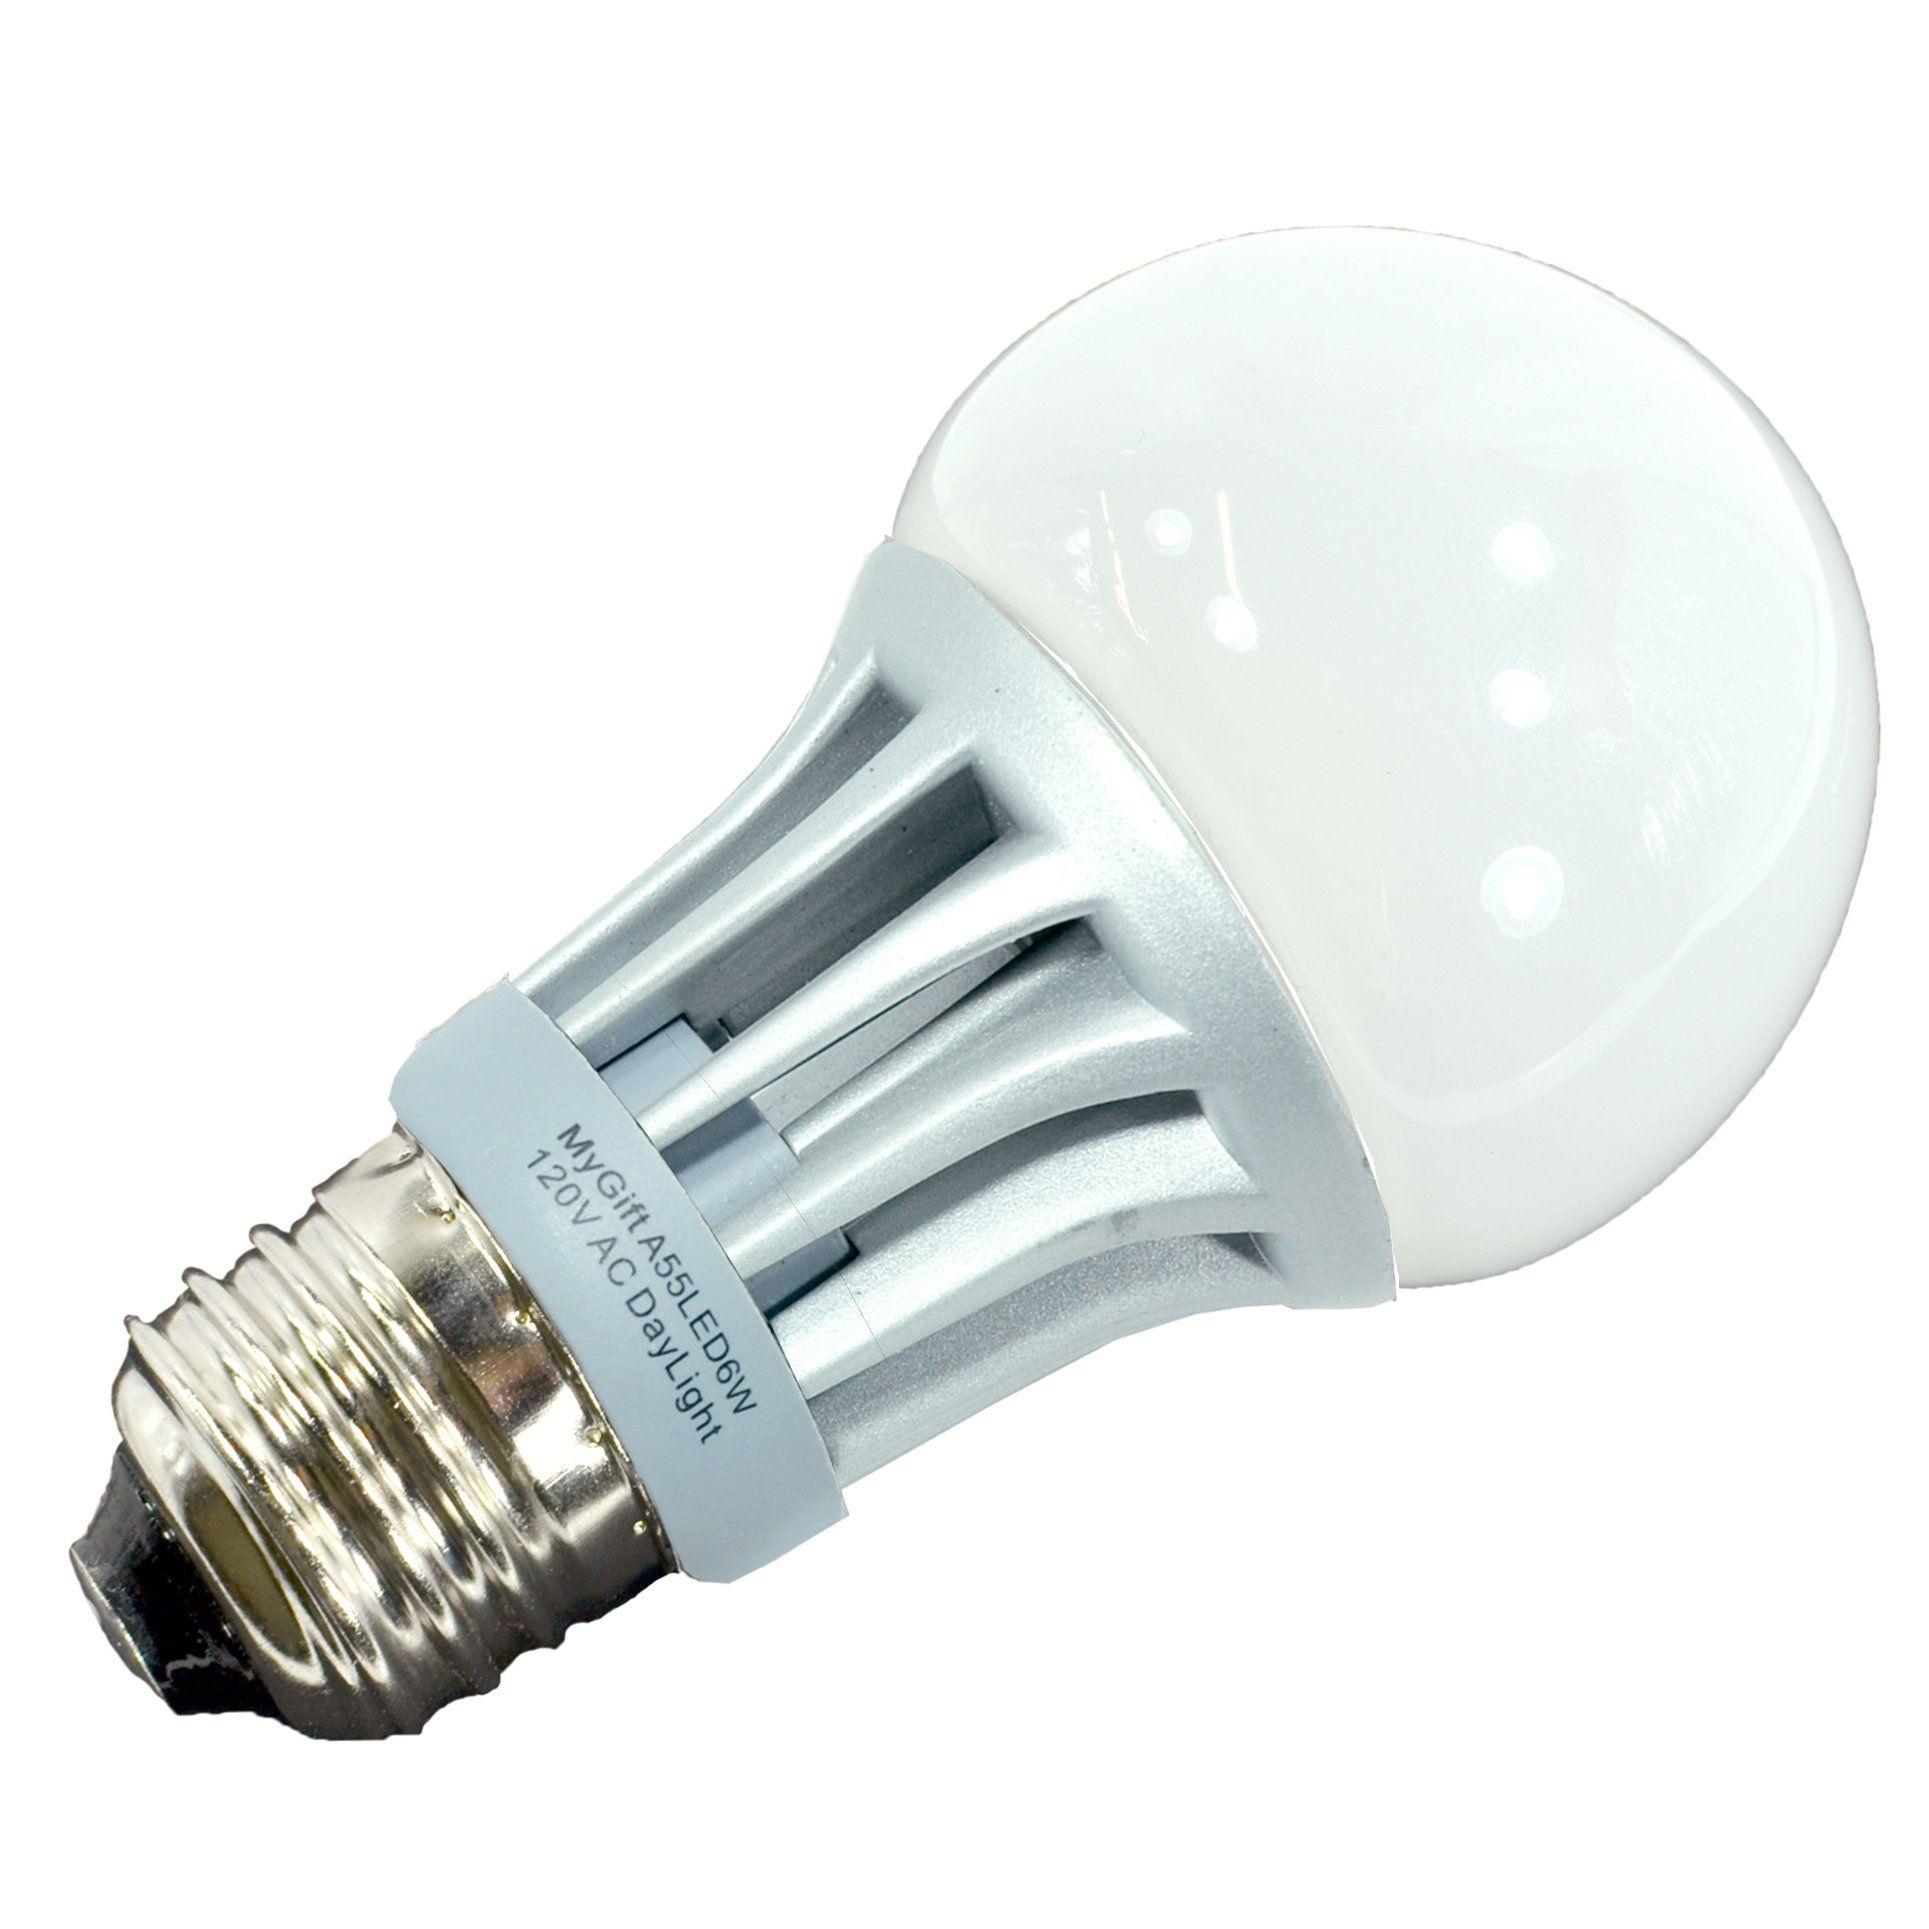 Mygift 6w Led Standard Size 60 Watt A19 Replacement Daylight Spectrum High Efficiency Energy Saver Home Light Bulb 6000k Day Led Light Bulb Lamp Light Led Bulb